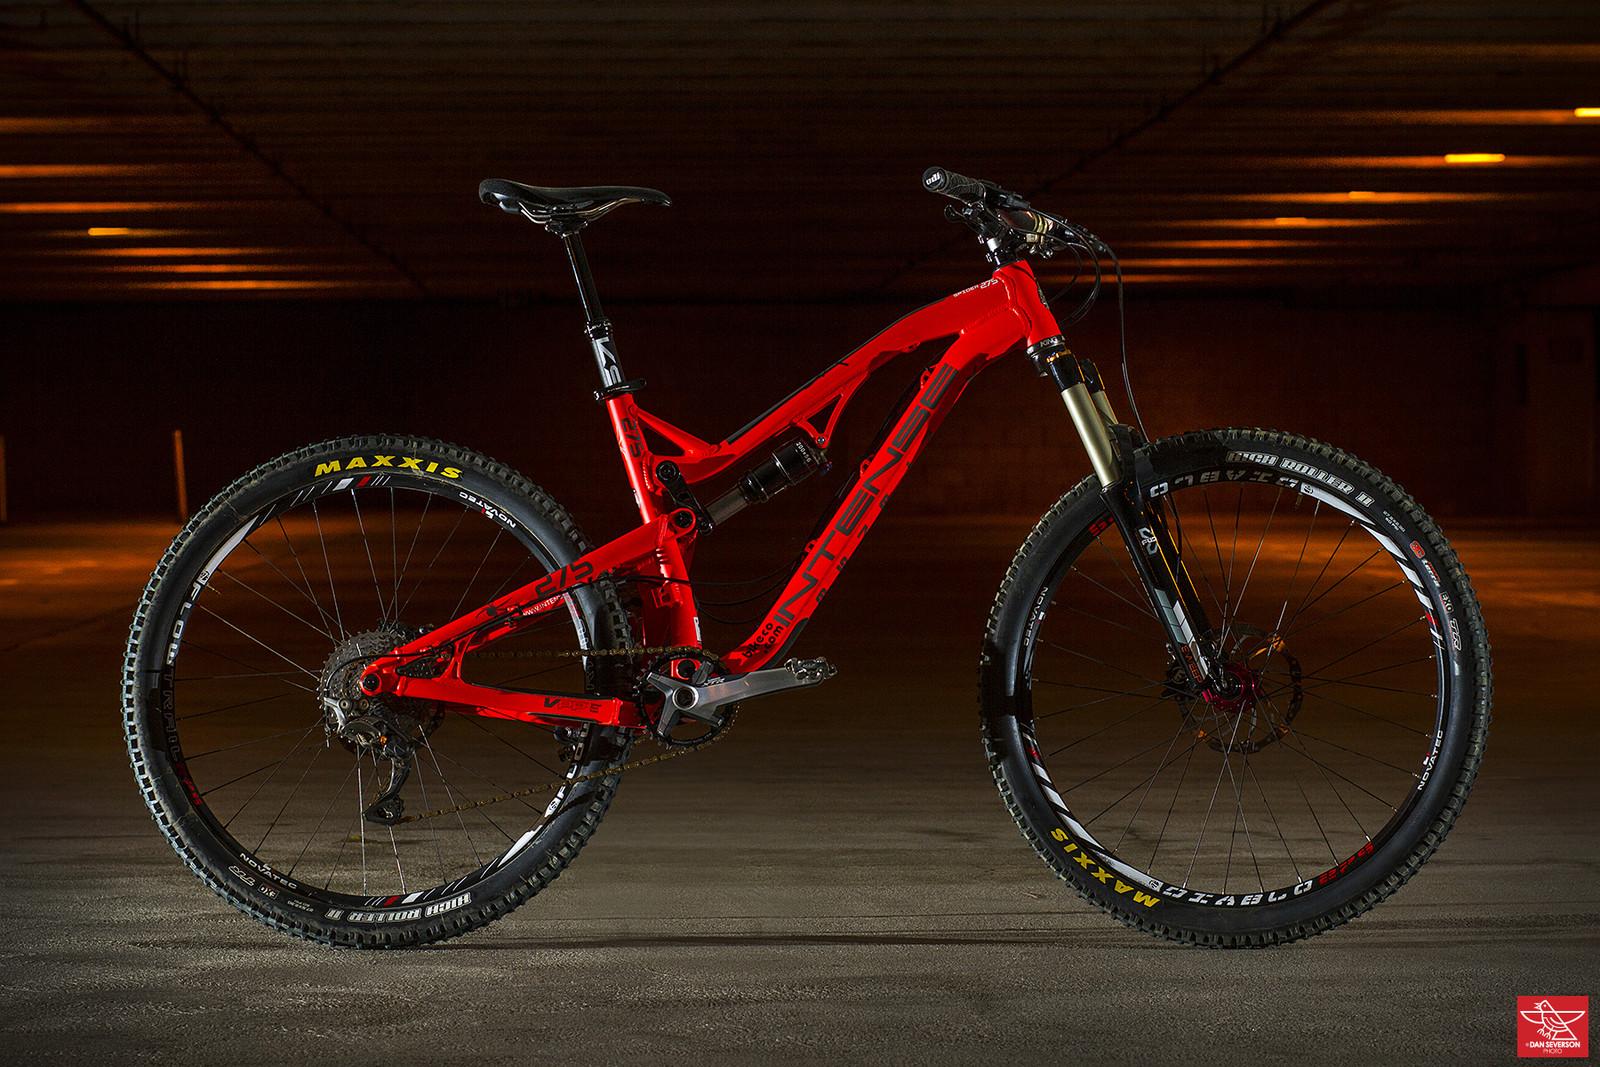 Pro Bike Check: Brian Lopes' Intense Spider 27.5 - Pro Bike Check: Brian Lopes' Intense Spider 27.5 - Mountain Biking Pictures - Vital MTB